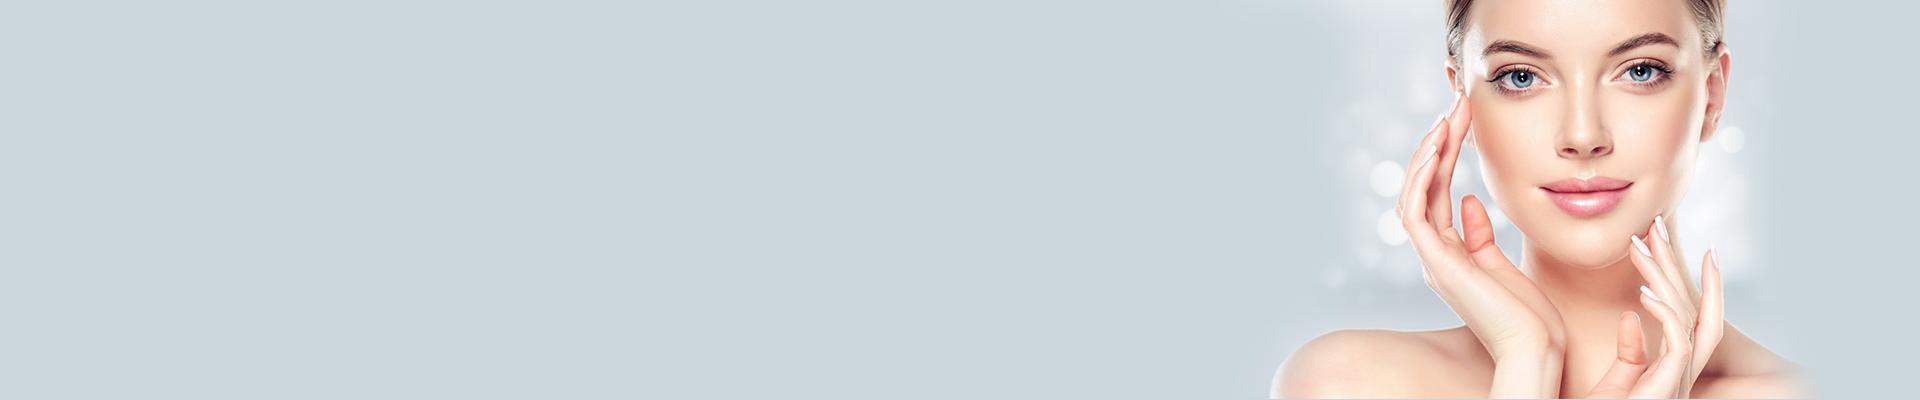 [:fr]Lifting cervico-facial Nabeul : Lifting du visage, prix lifting facial pas cher[:ar]عمليات تجميل الوجه والرقبة نابل: شد الوجه ، سعر شد الوجه[:]